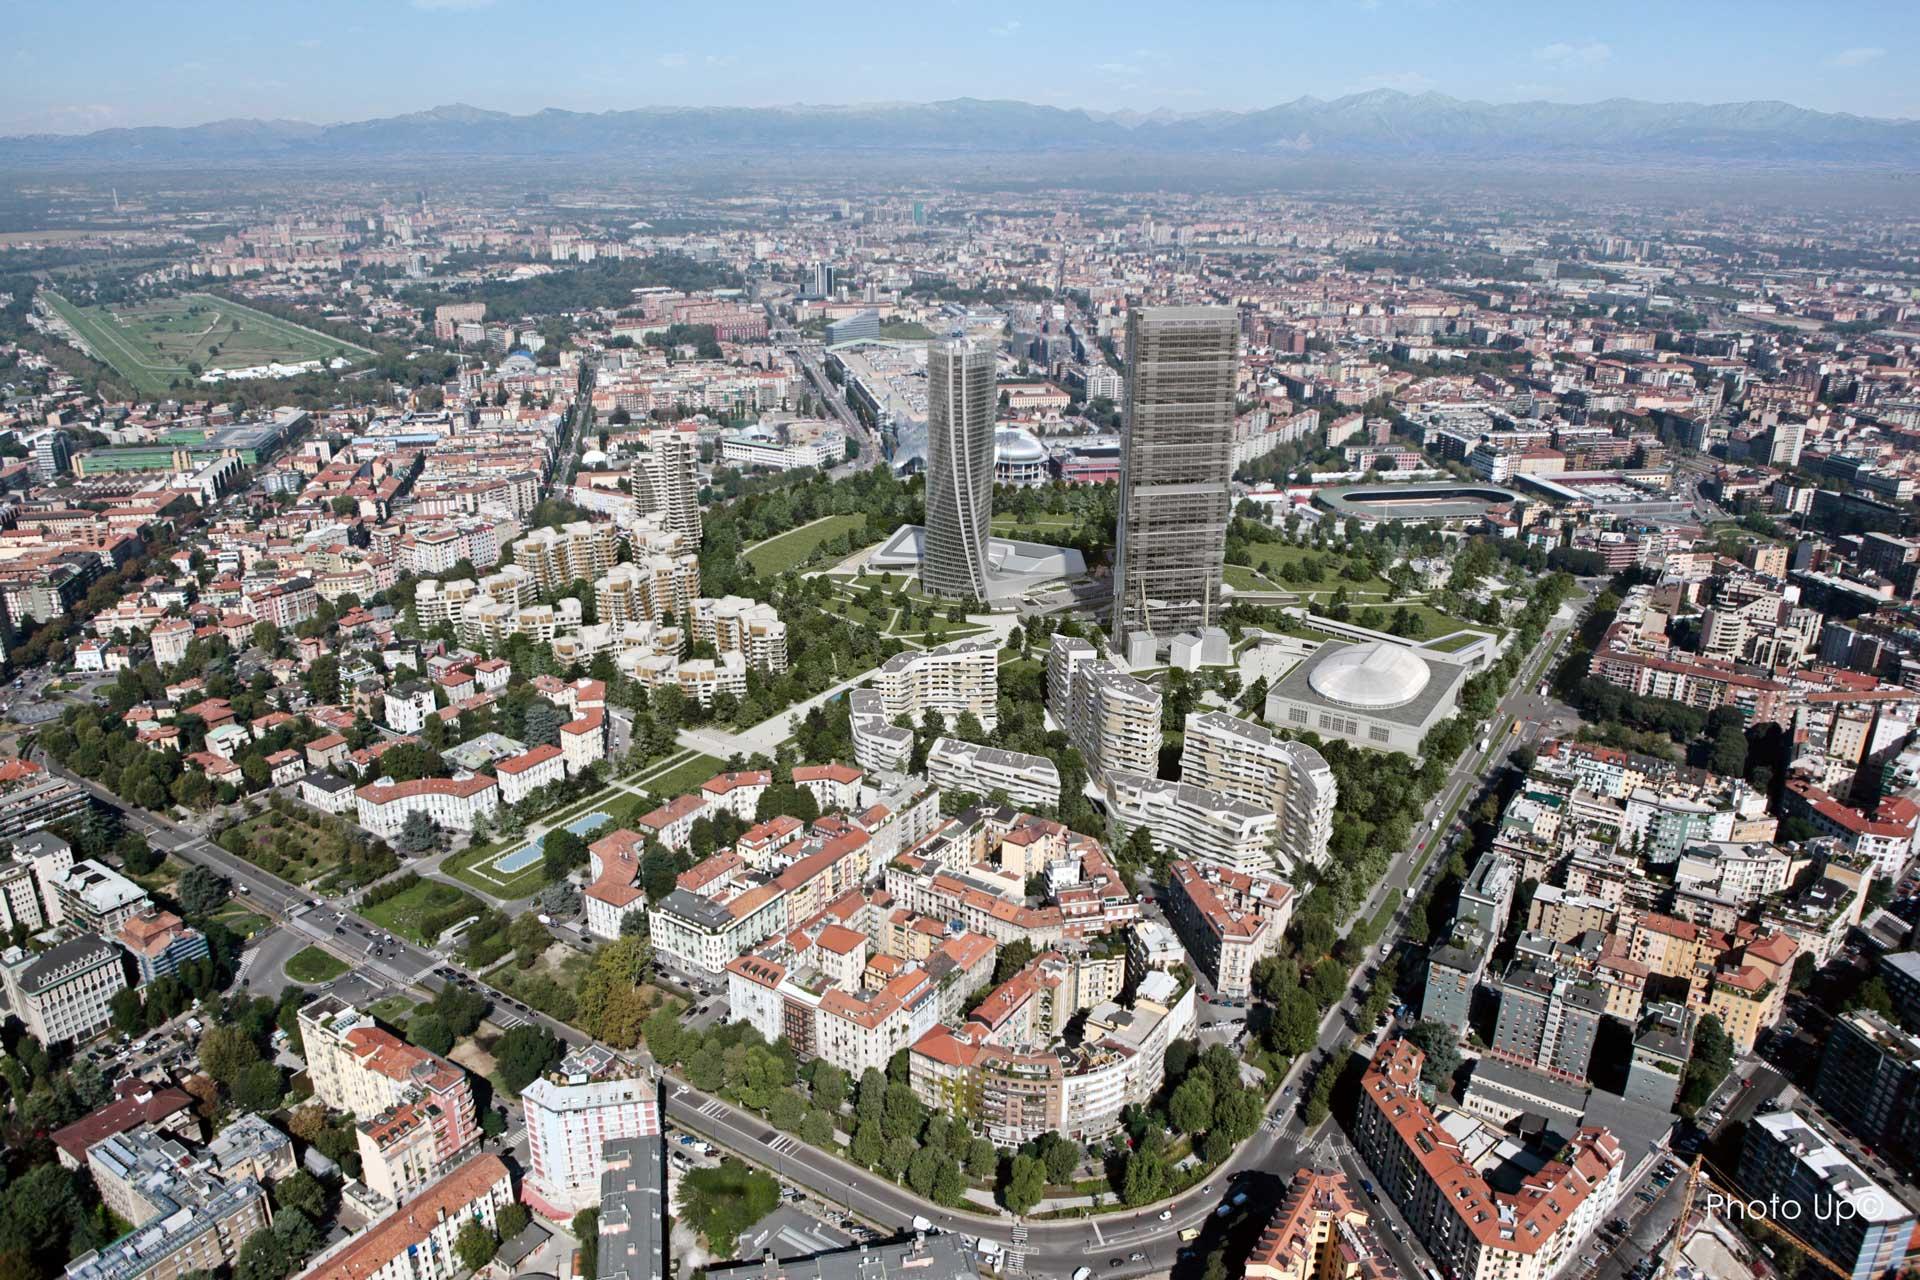 ZHA_Citylife_Generali-Tower_Milan_Aerial-View-2